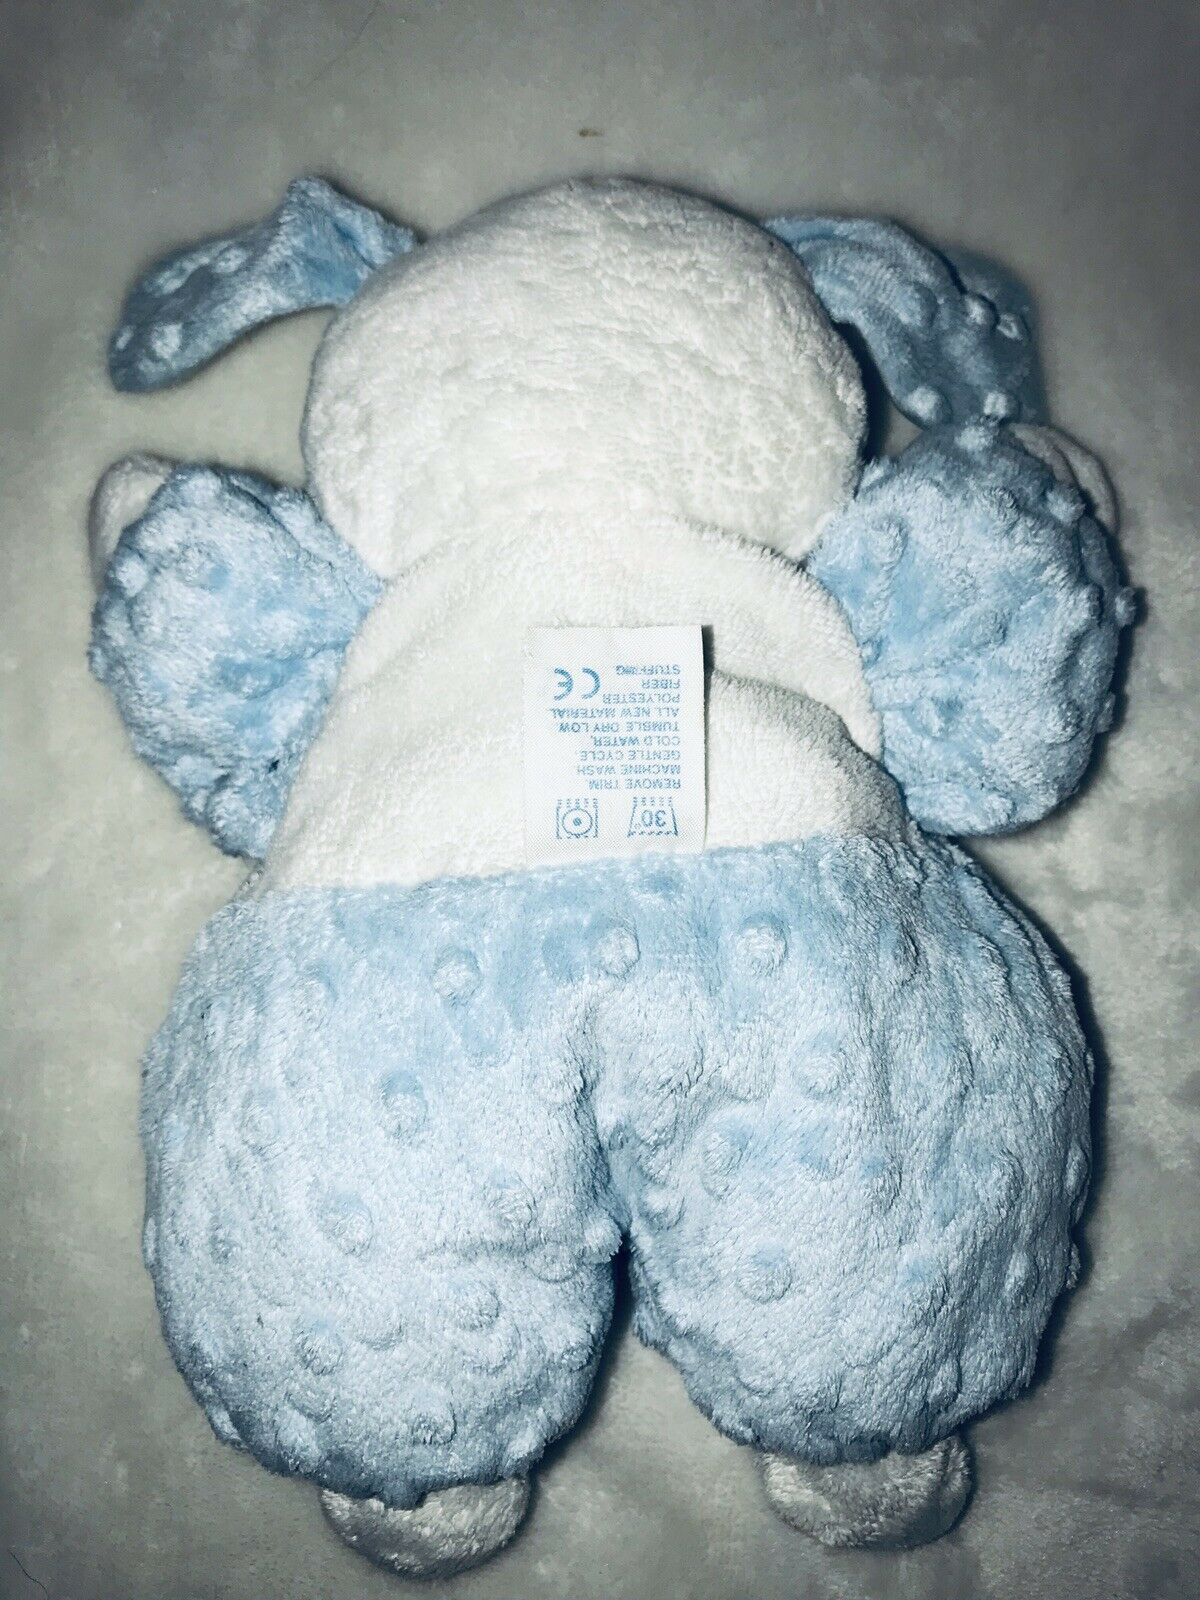 Kids Preferred Blue White So Cute Puppy Dog Minky Dot Plush Stuffed Baby Toy HTF image 2